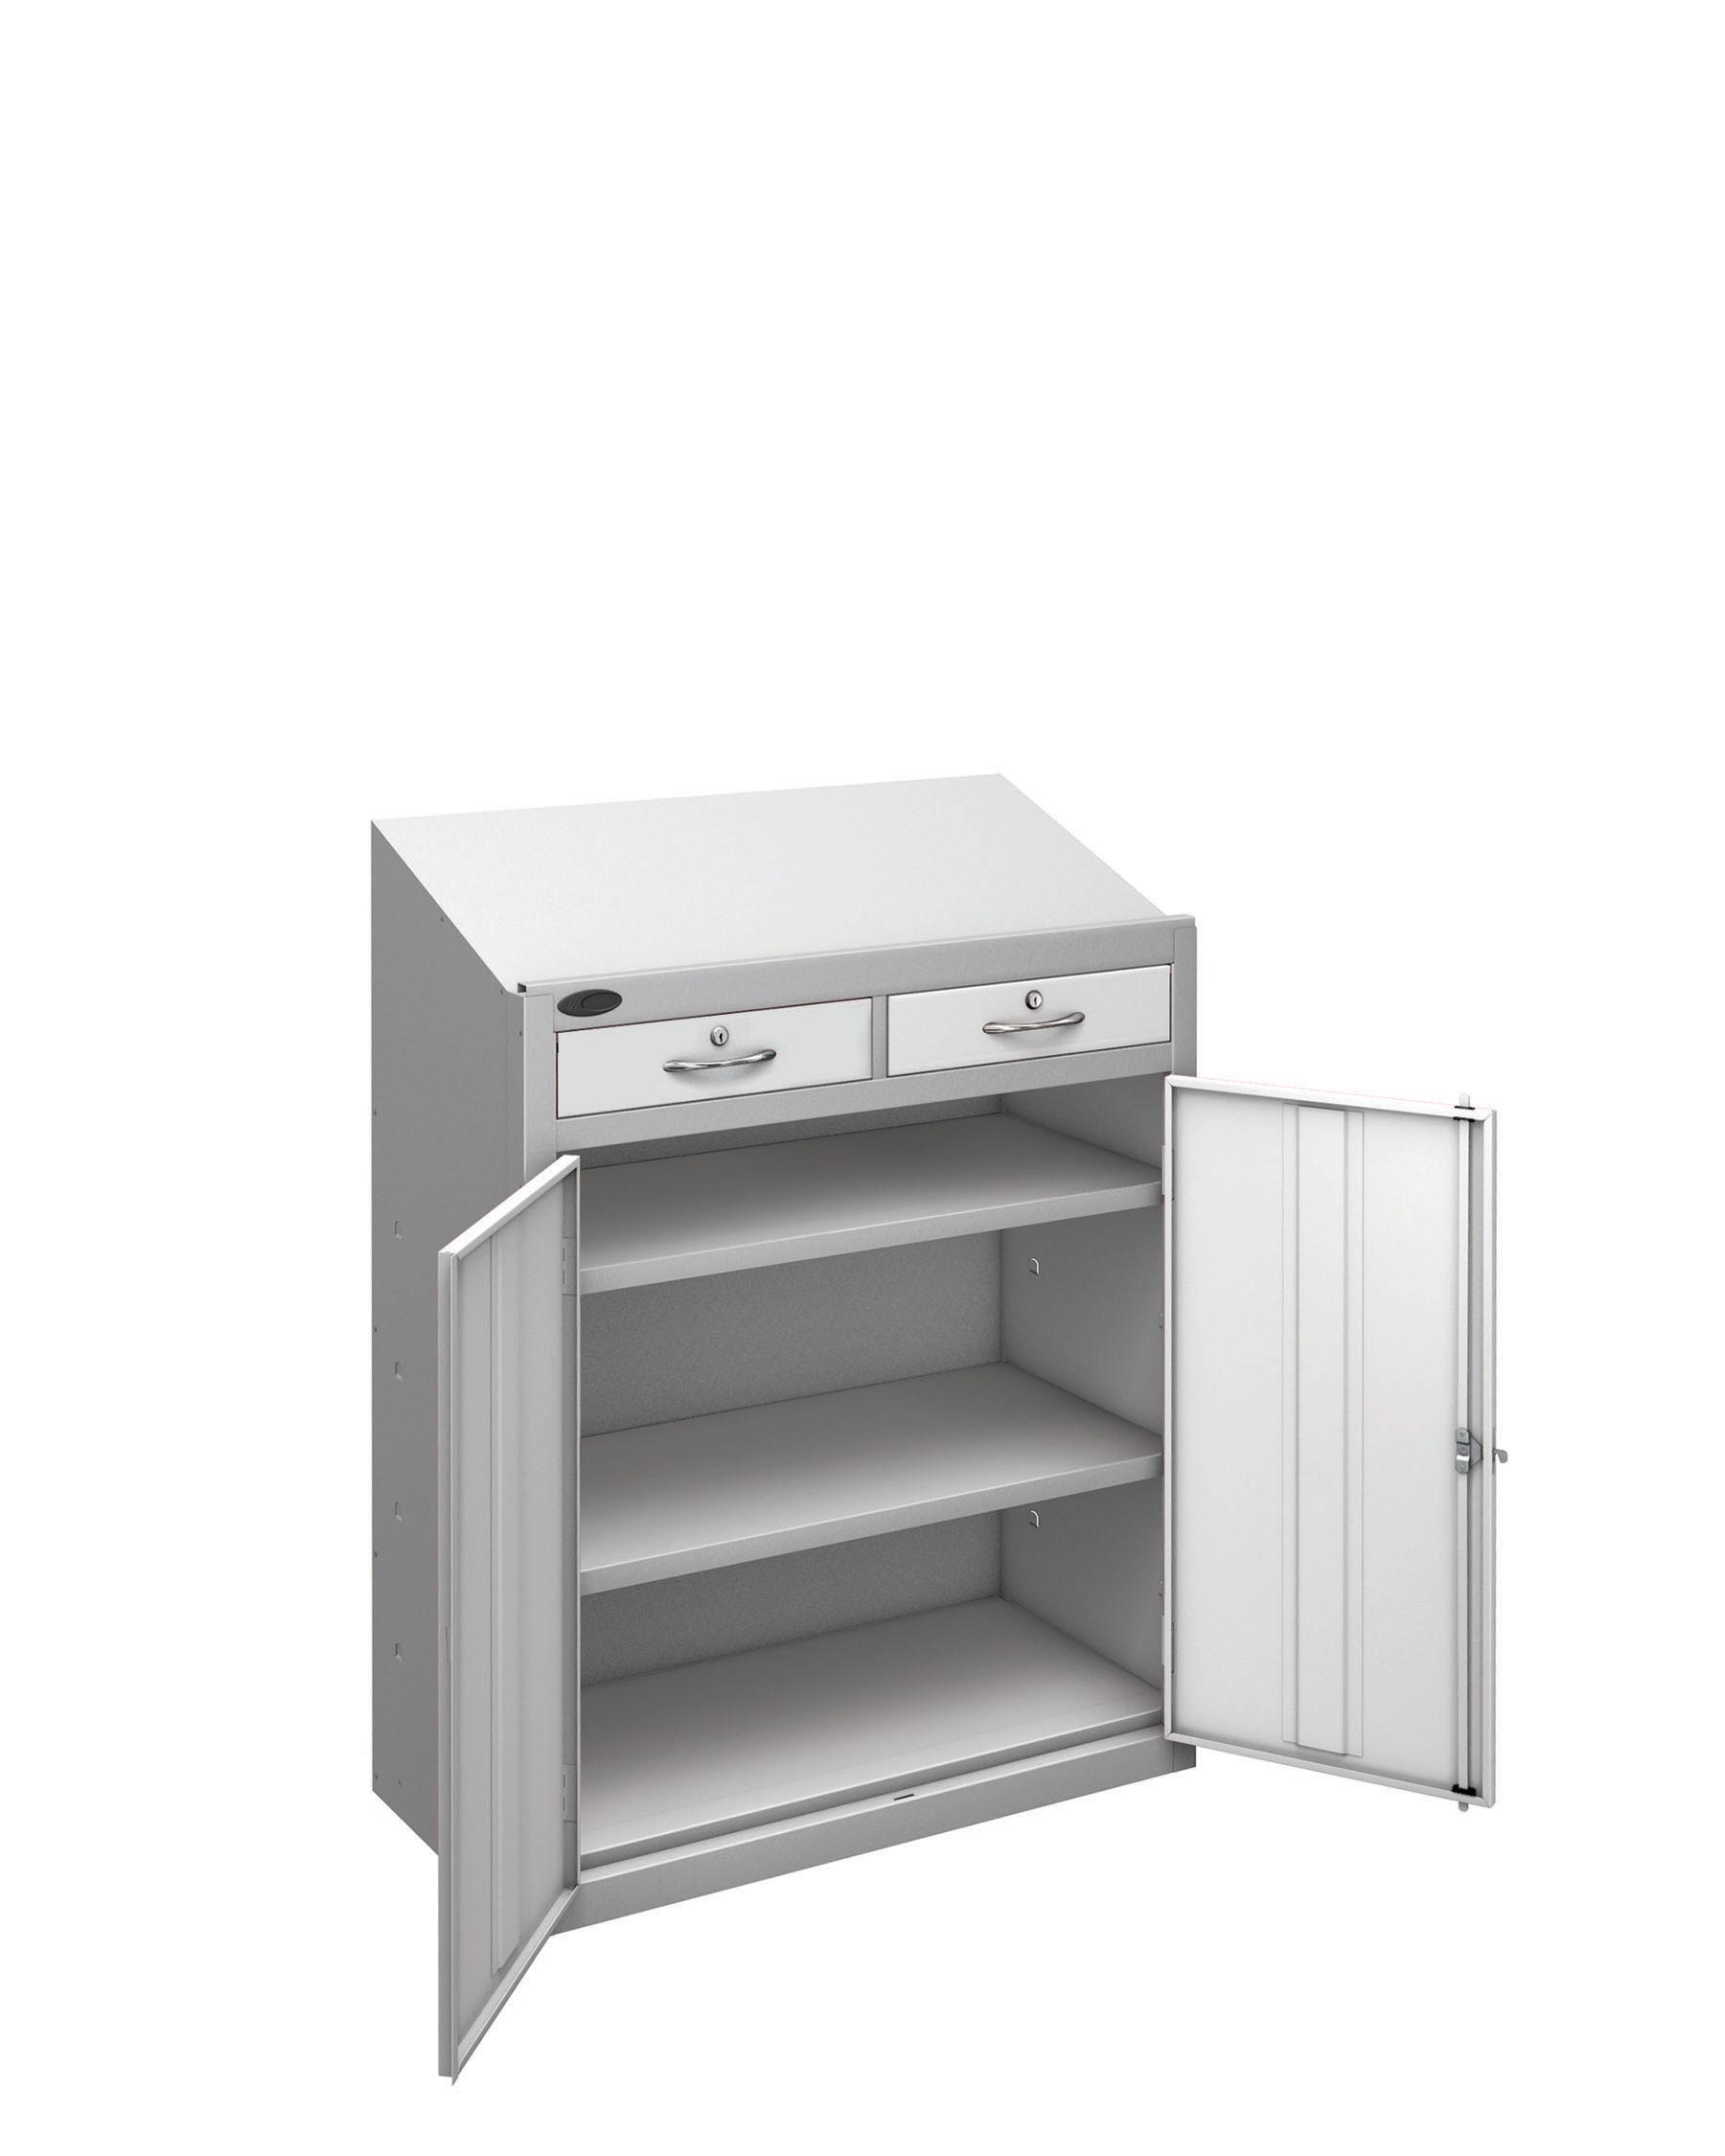 Probe workstation slope drawer white